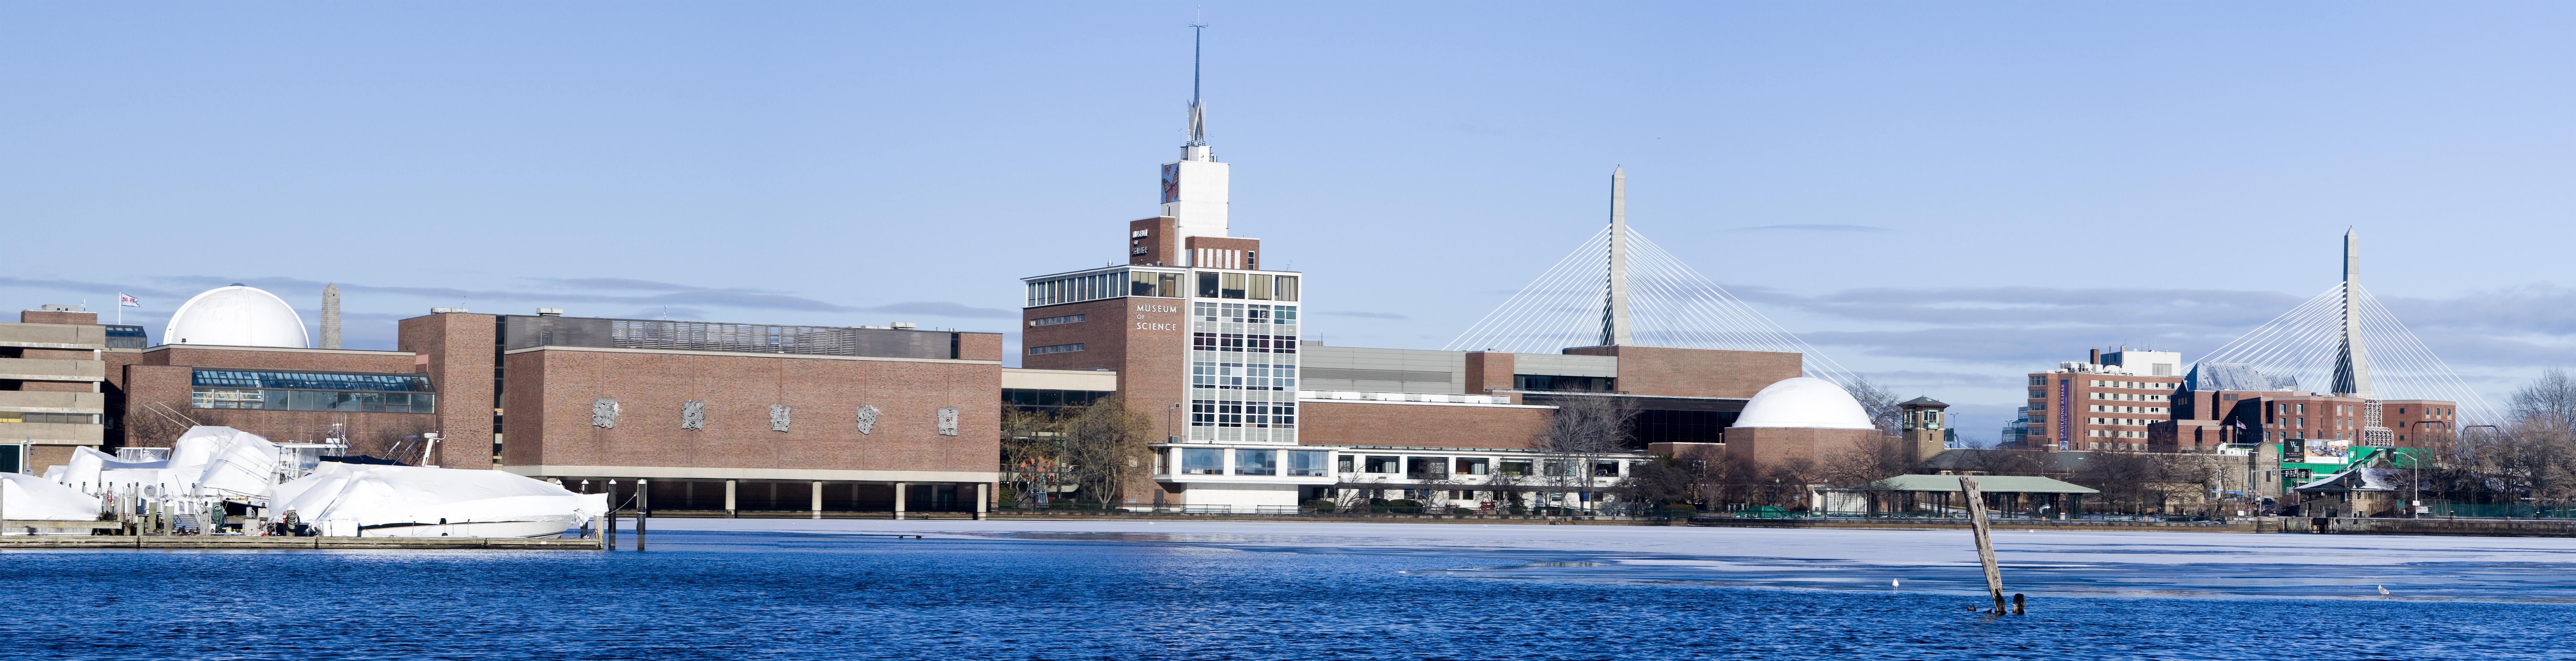 File:MOS Boston on Charles.jpg